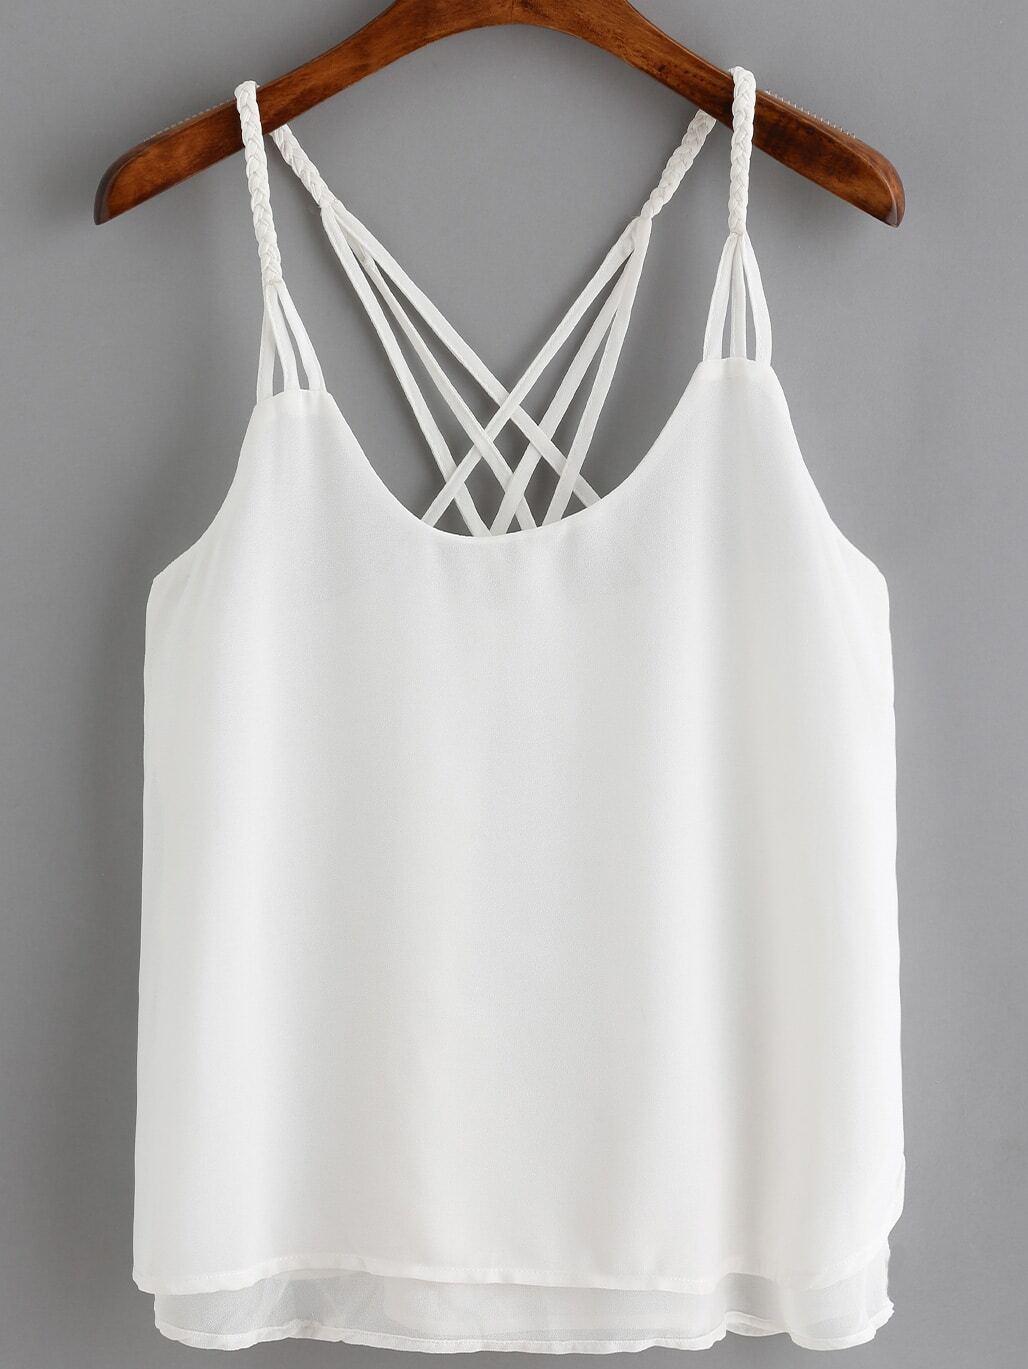 777bb46eaabd3a White Spaghetti Strap Loose Cami Top EmmaCloth-Women Fast Fashion Online